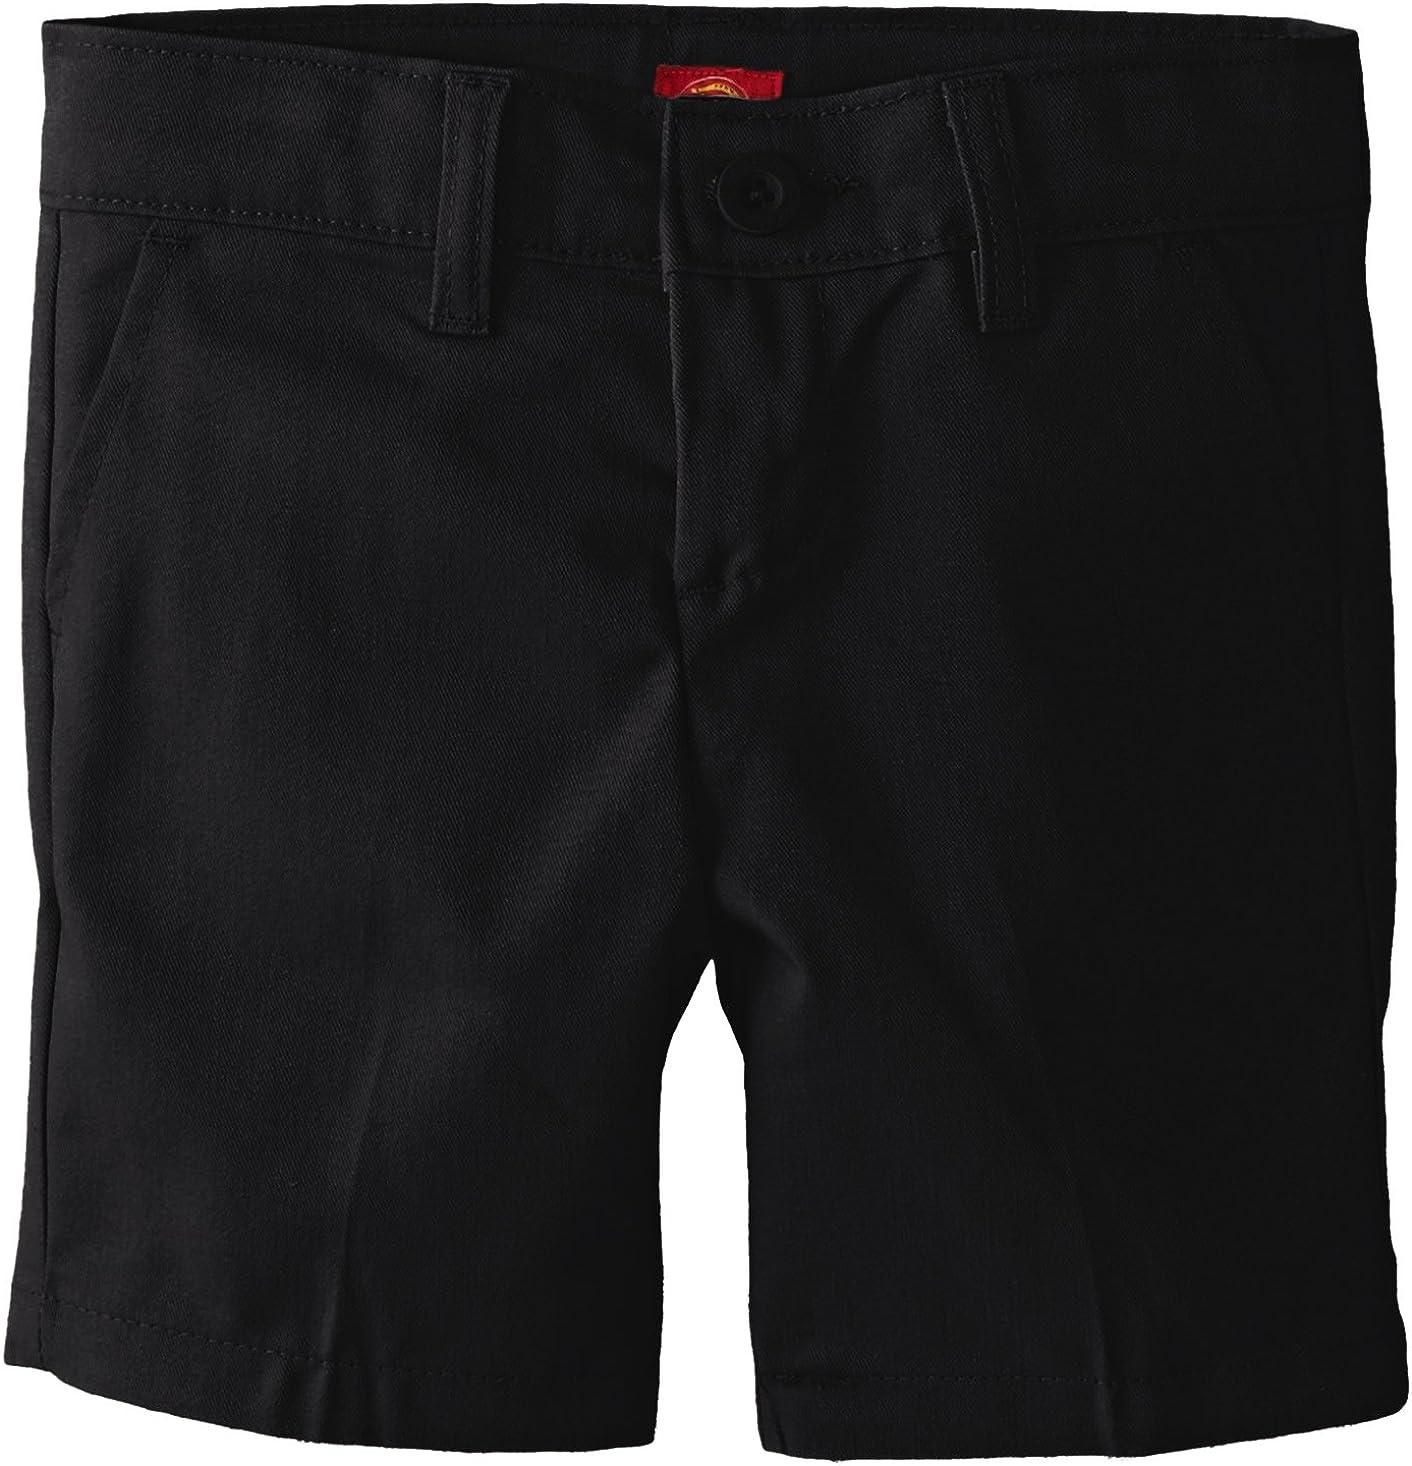 Dickies Girls Flex Waist Slim Fit Flat Front Short